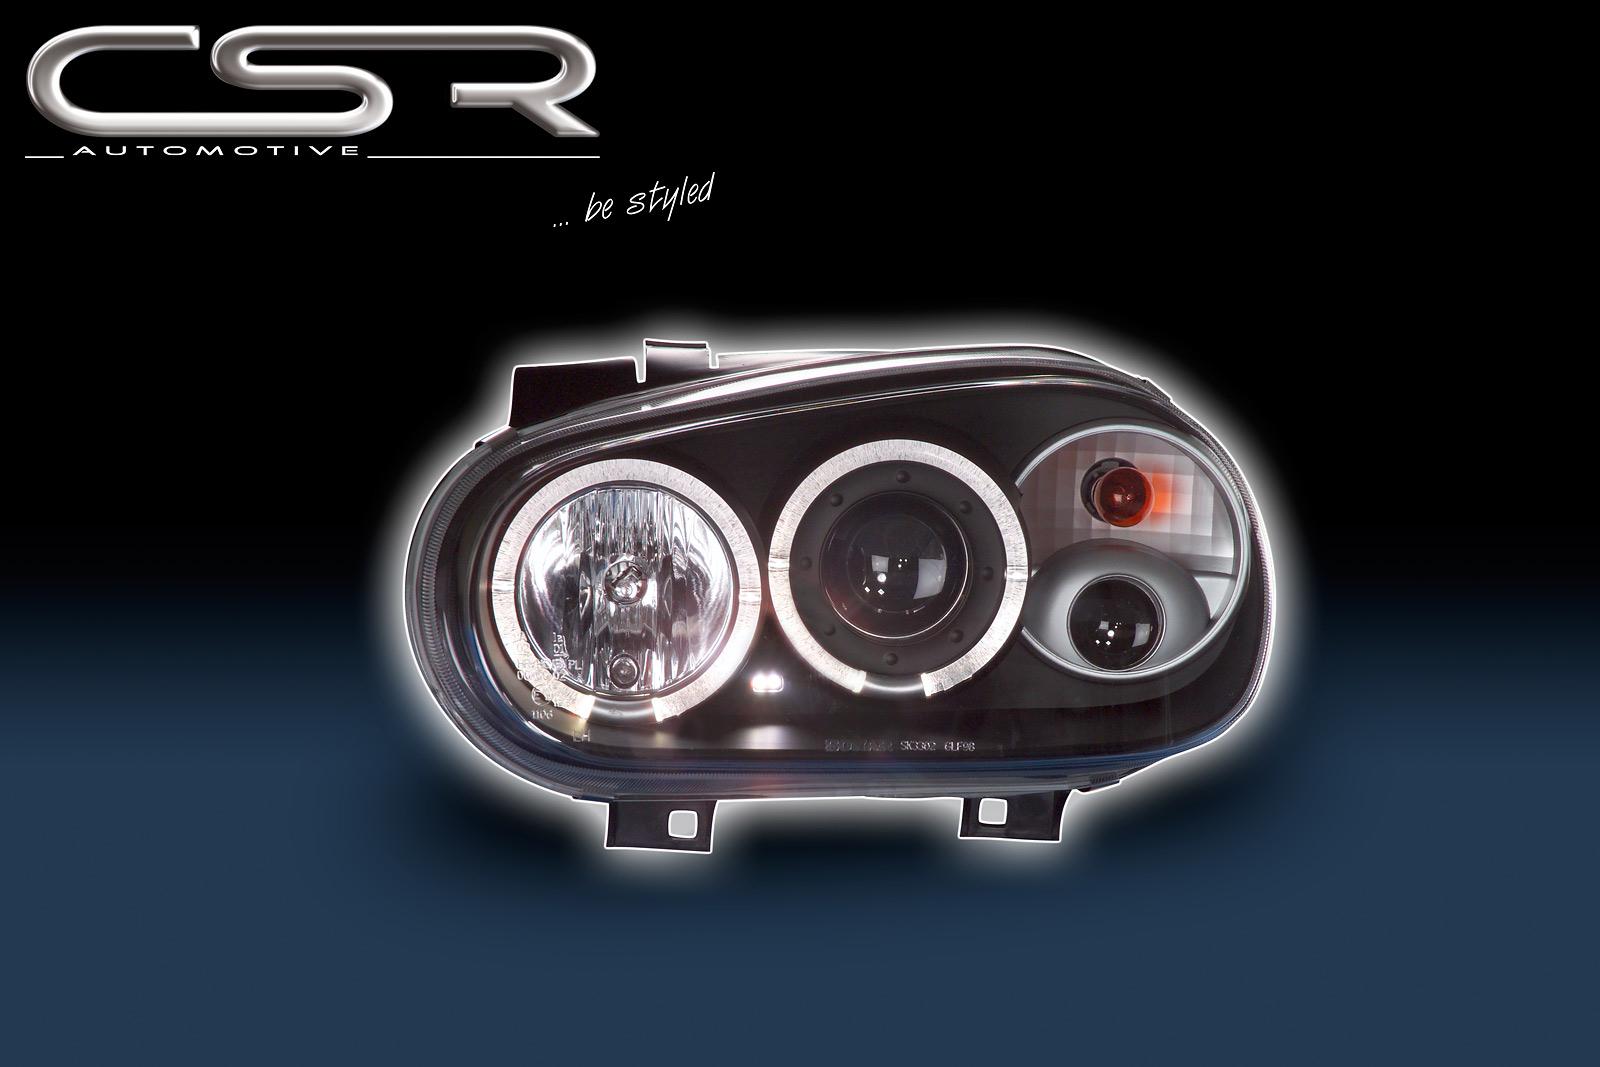 werbeagentur-focus-nuernberg-produktfotografie-csr-automotive-02